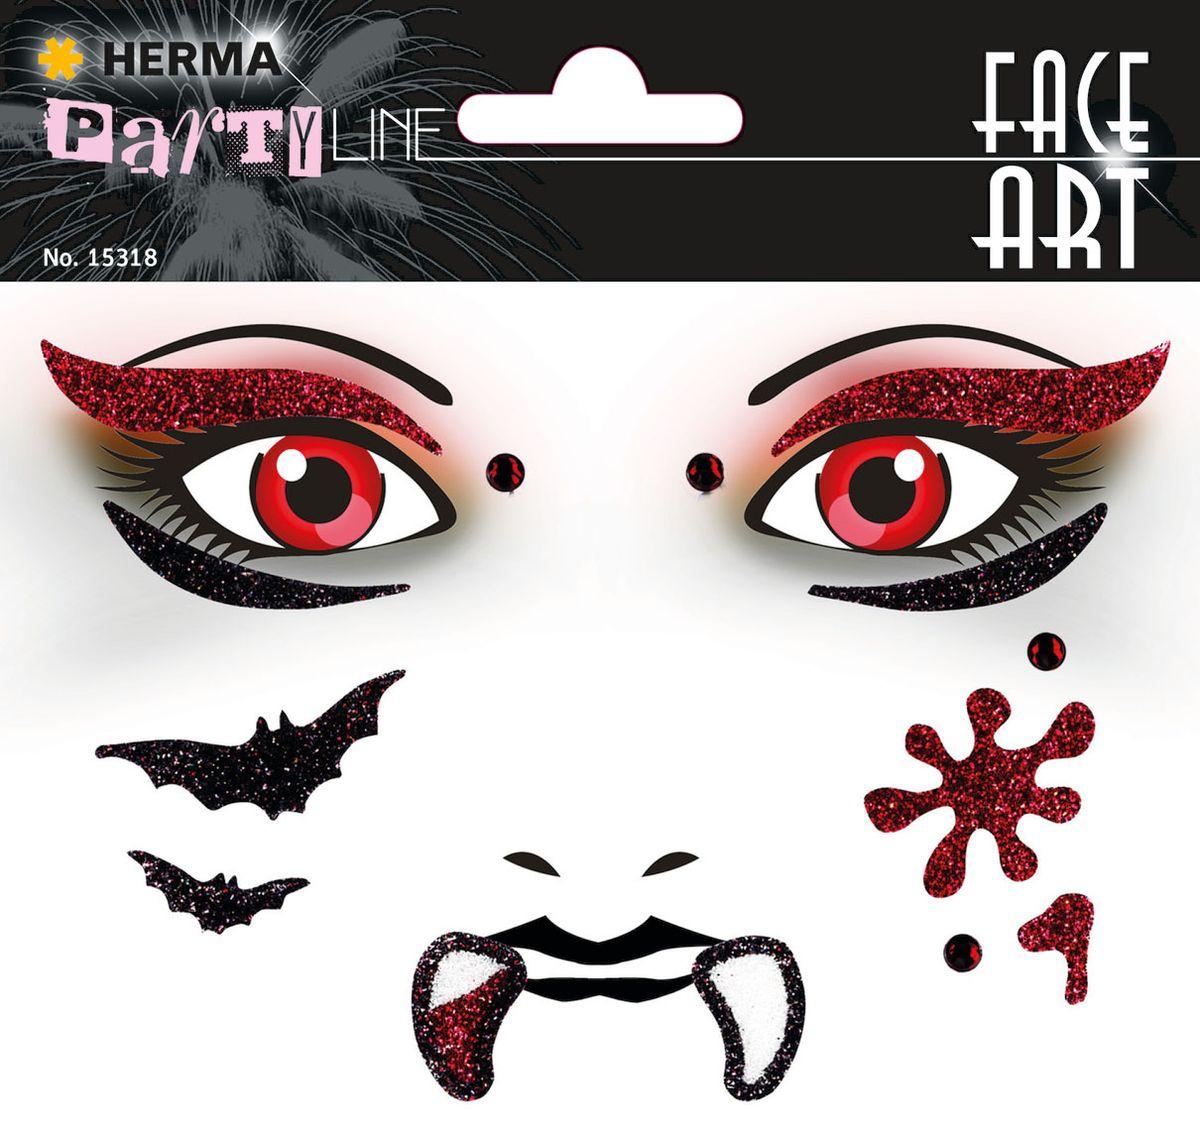 Herma Наклейки на лицо Face Art Вампир -  Наклейки